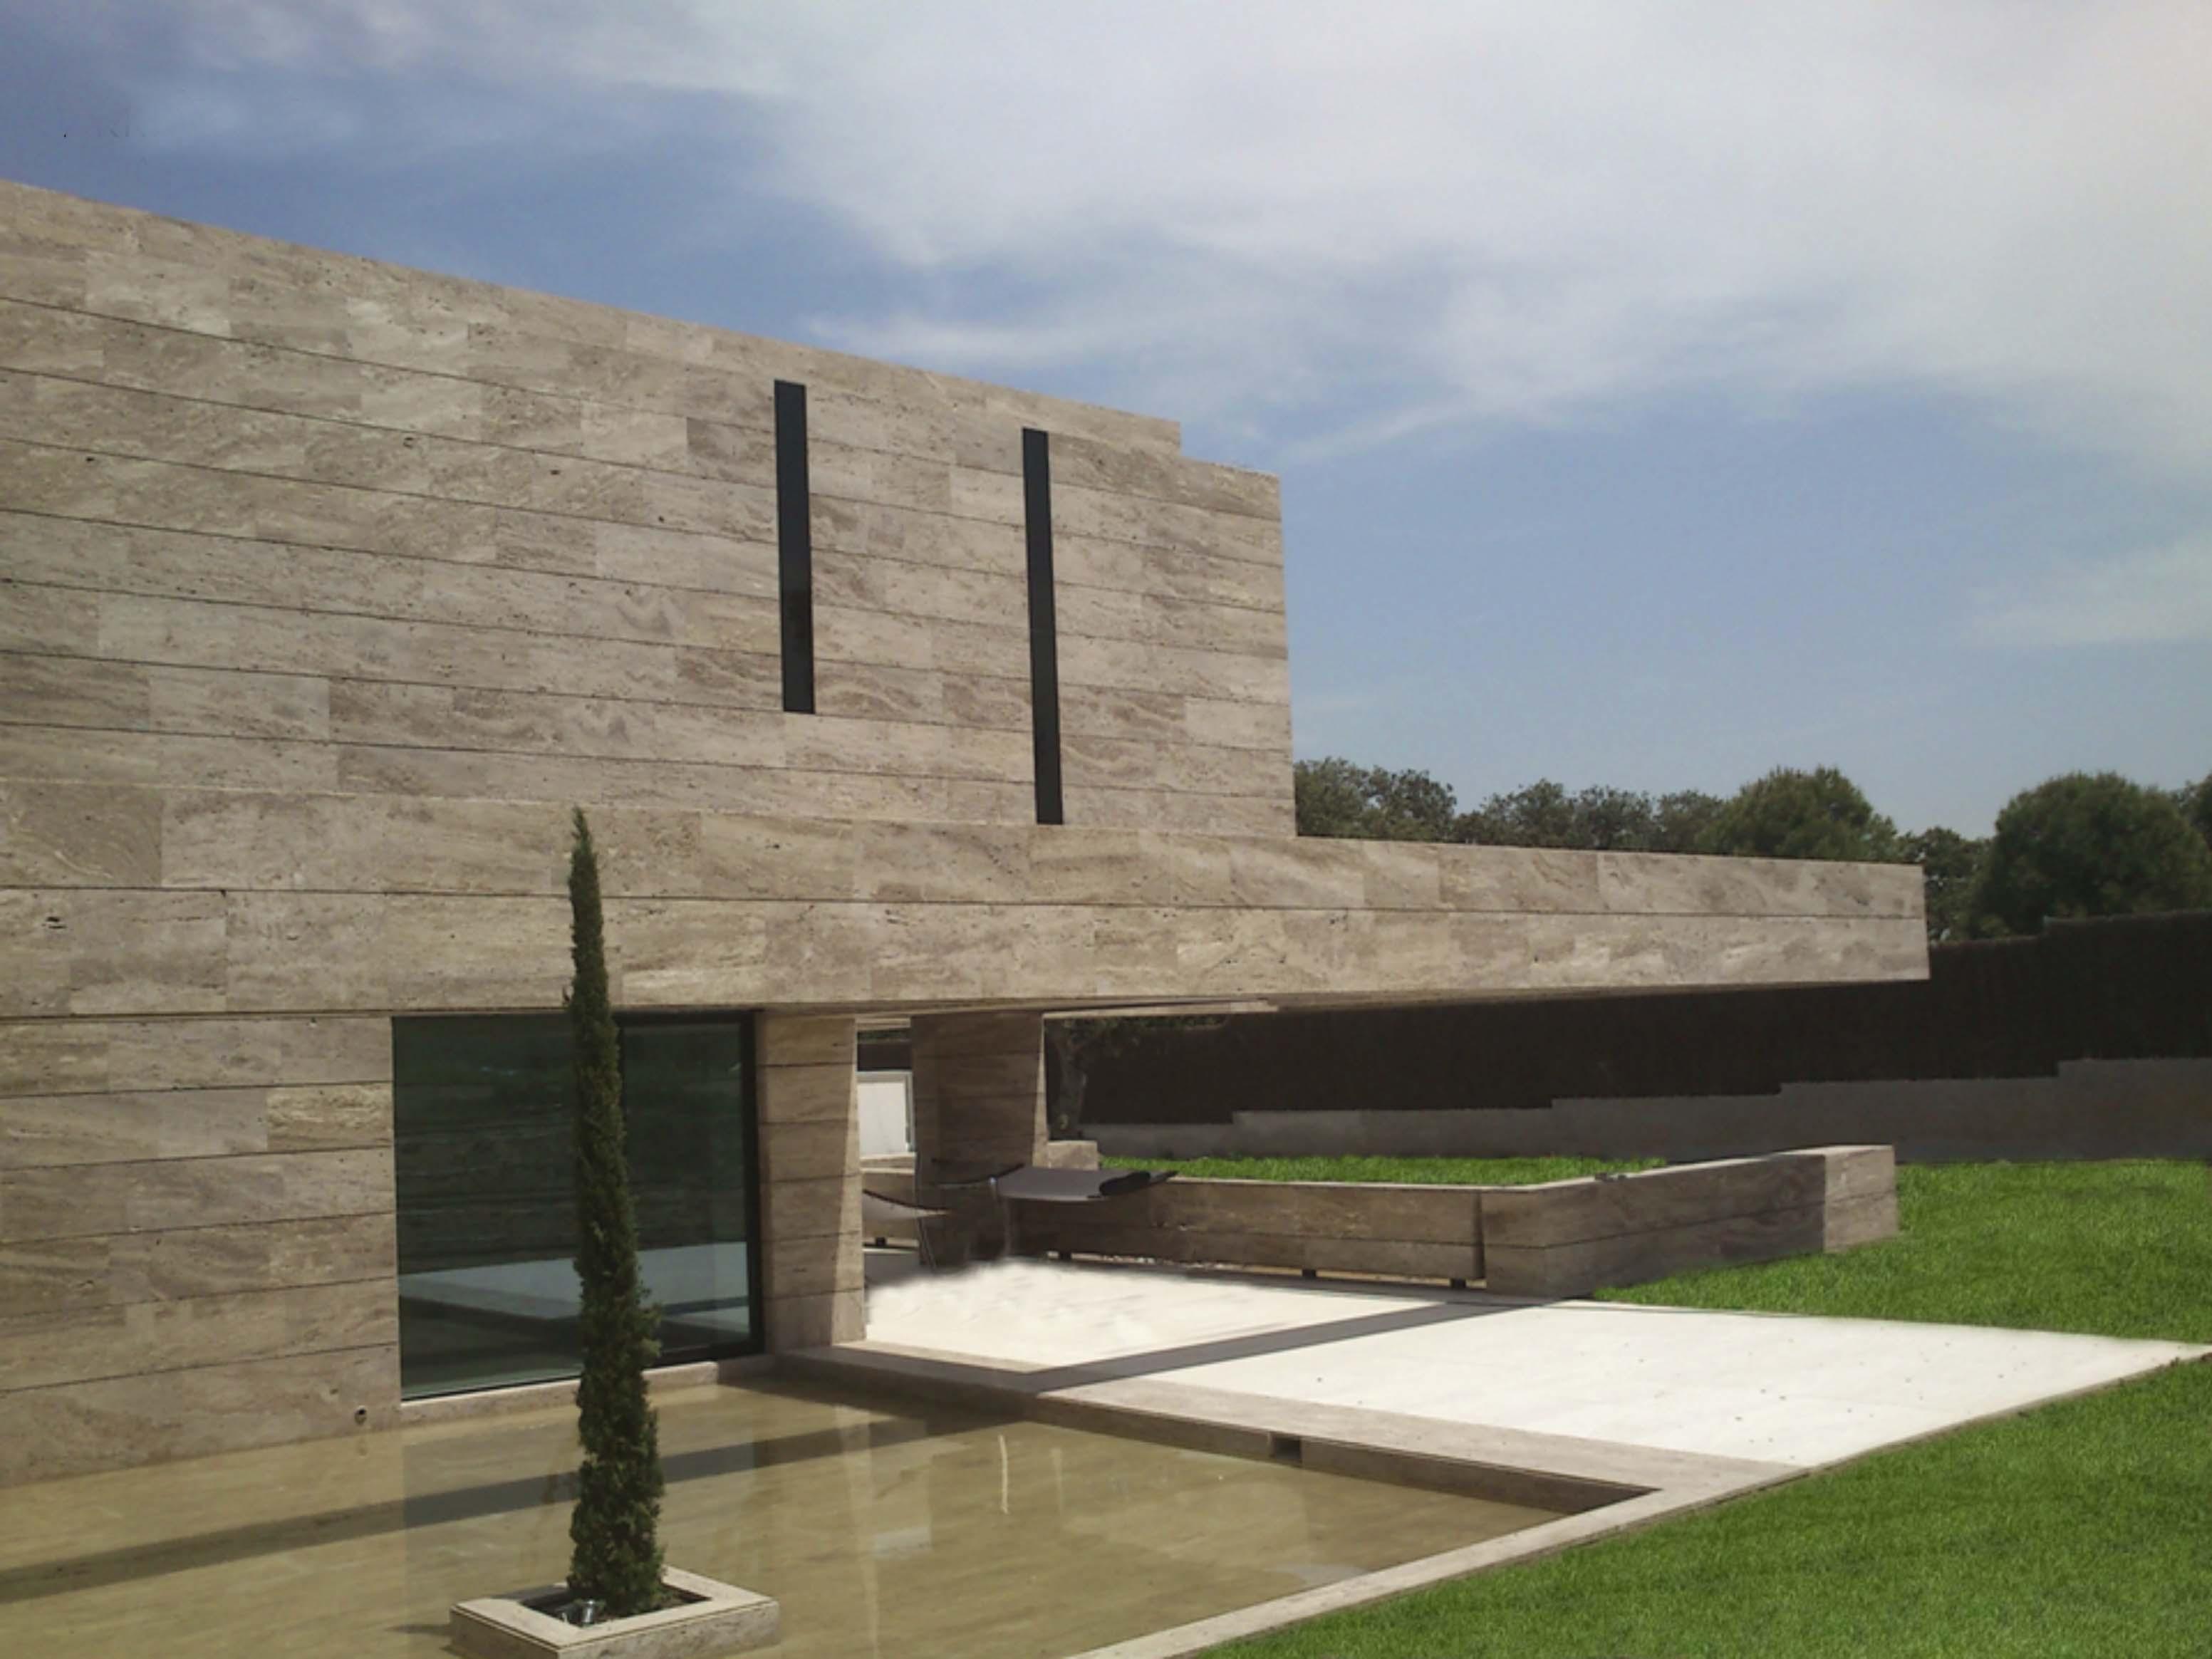 Pavimentos y revestimientos gunni trentino - Pavimentos de piedra natural ...